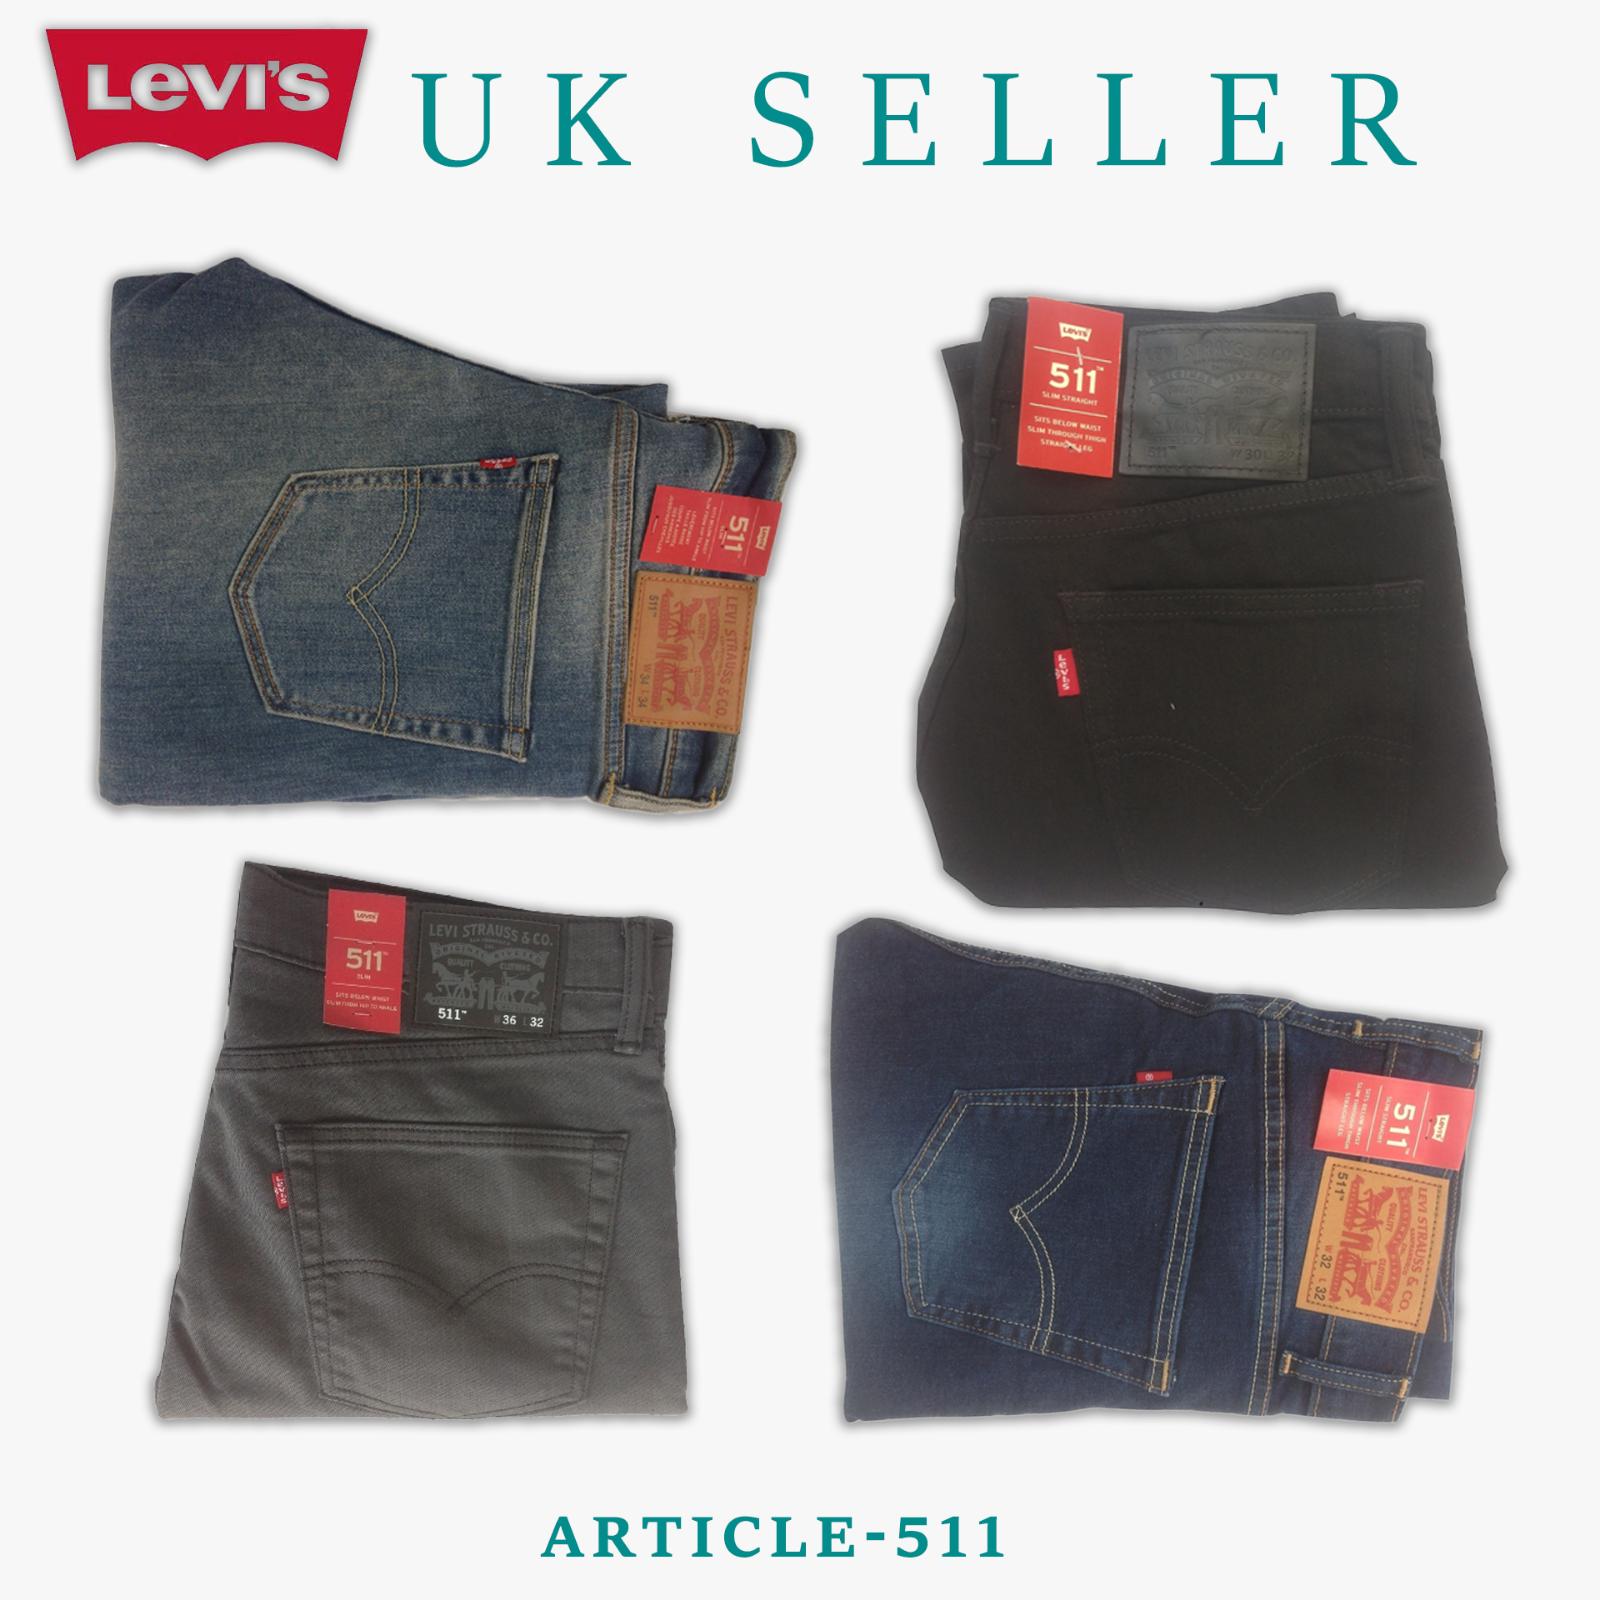 Levis 511 Slim Fit Men's Jeans Stretch Denim Comfortable Blu